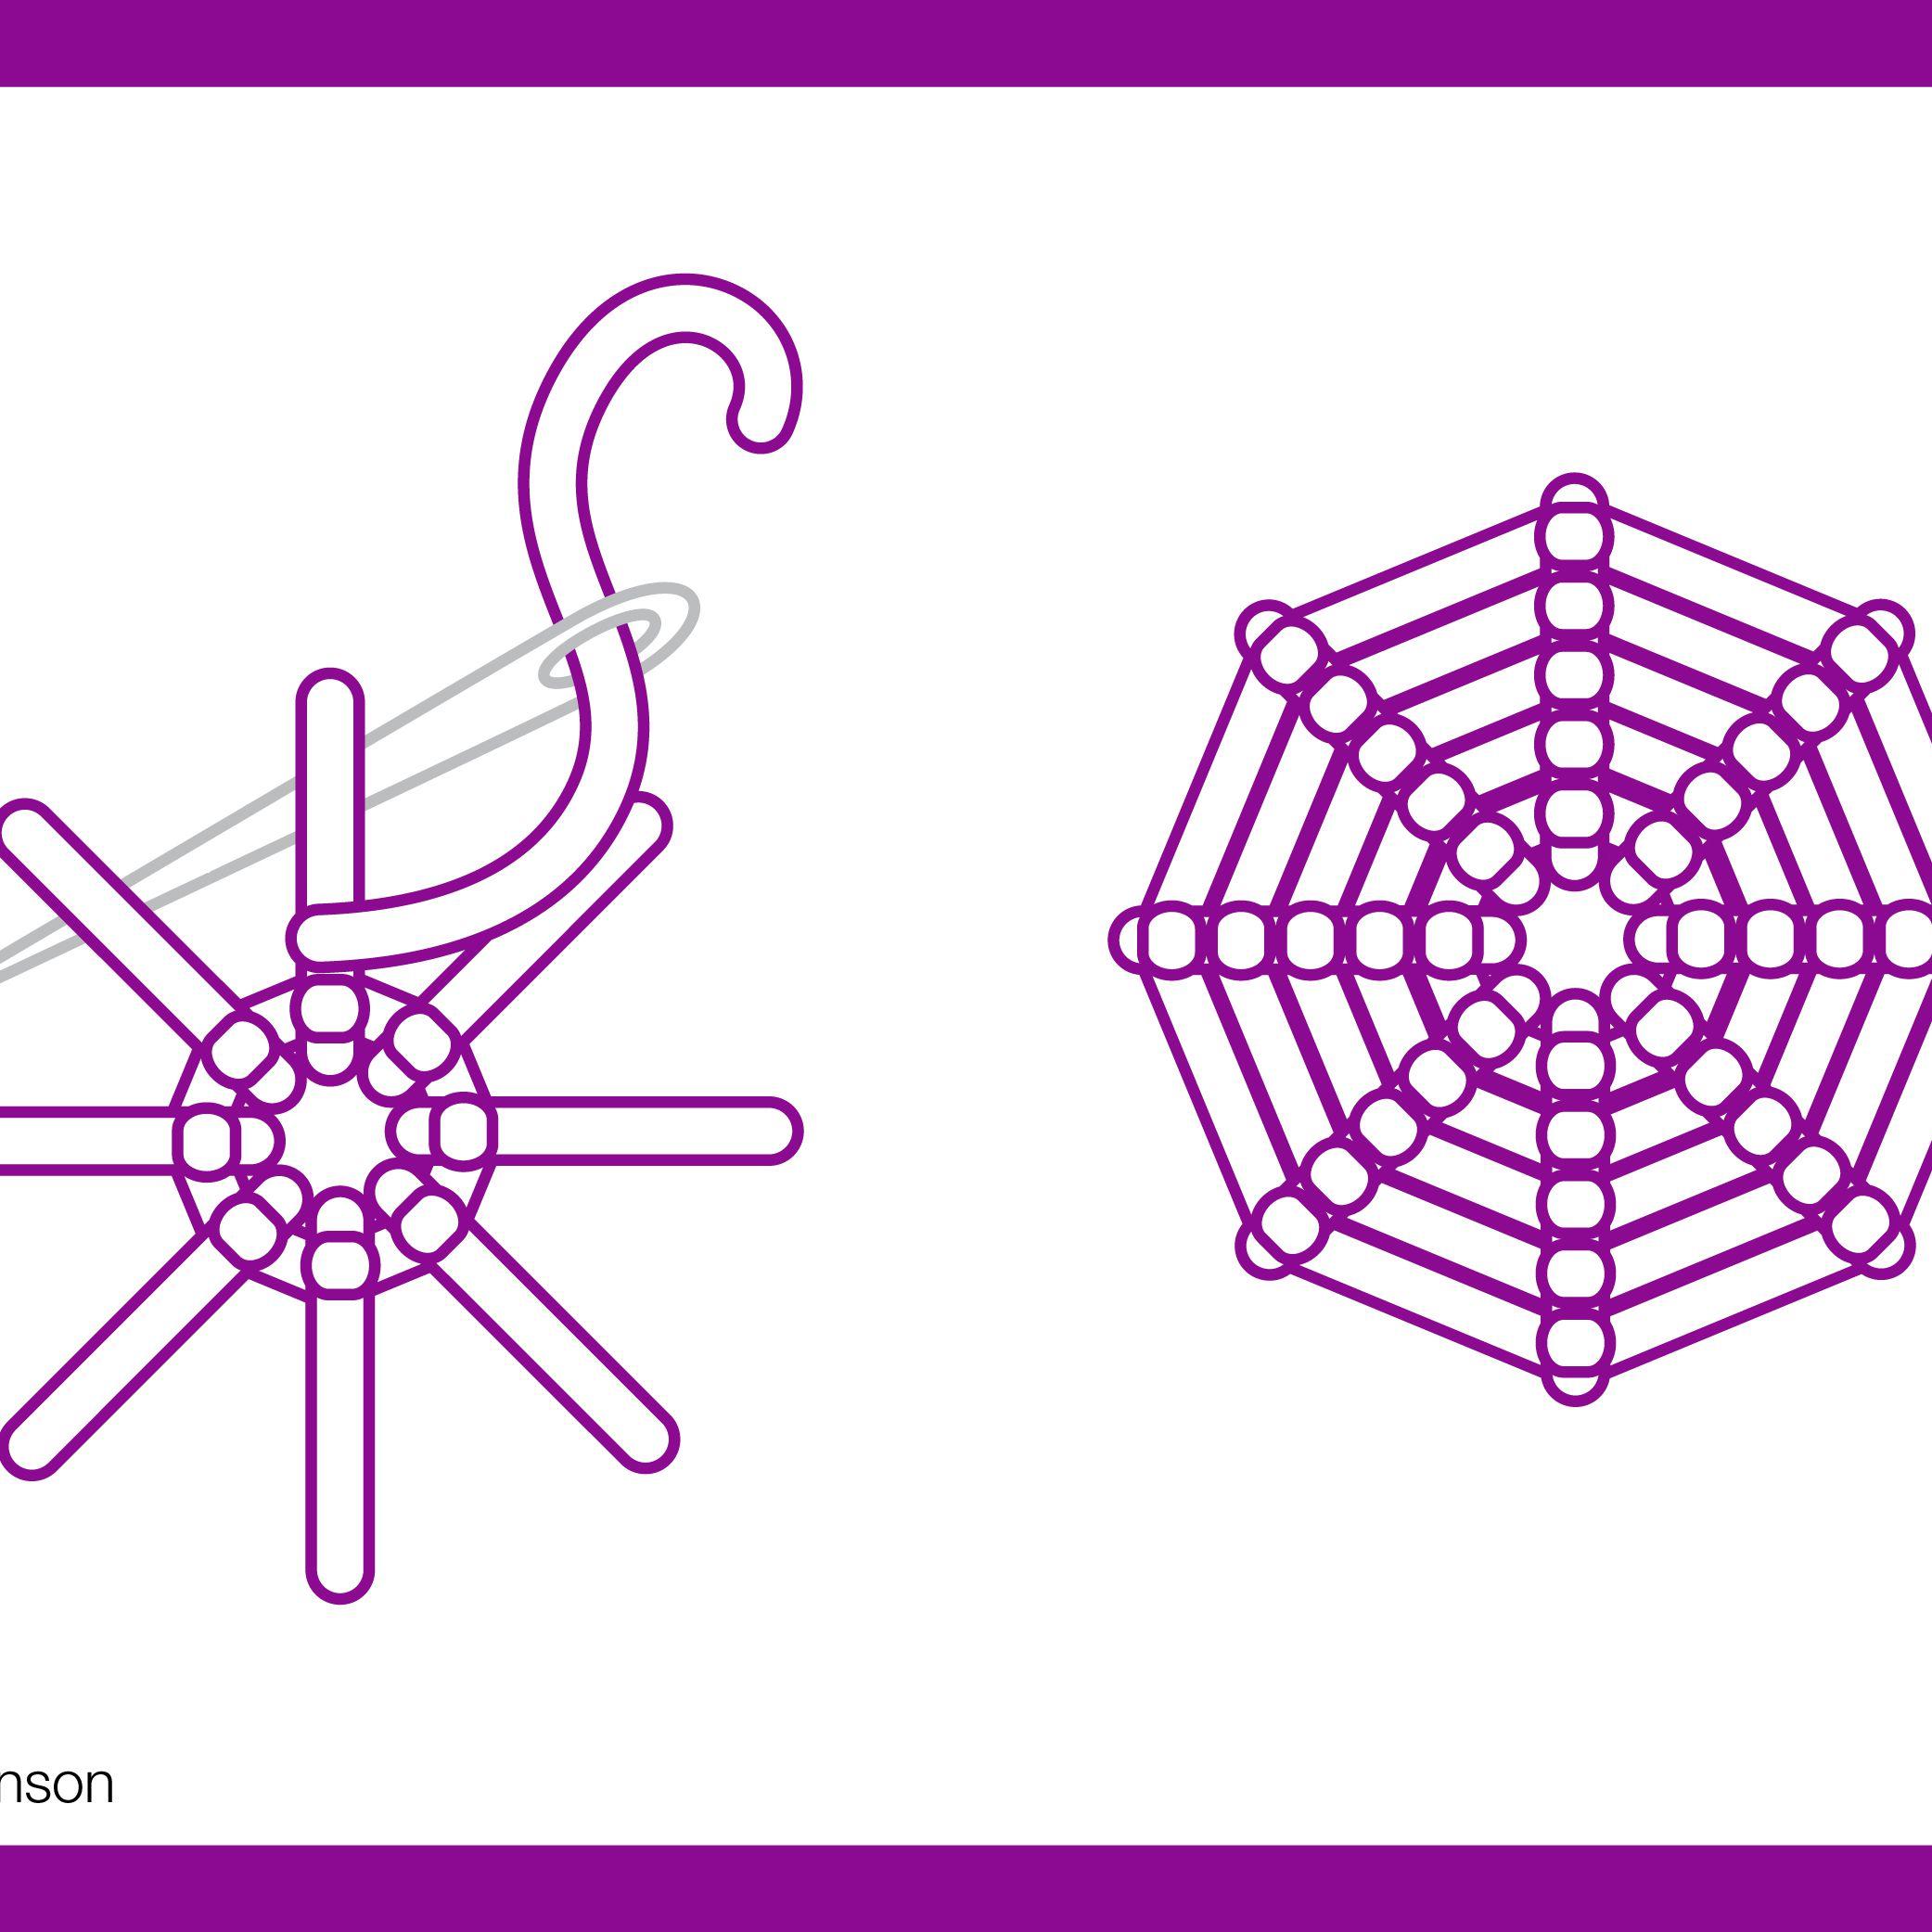 How To Work A Spider Web Stitch